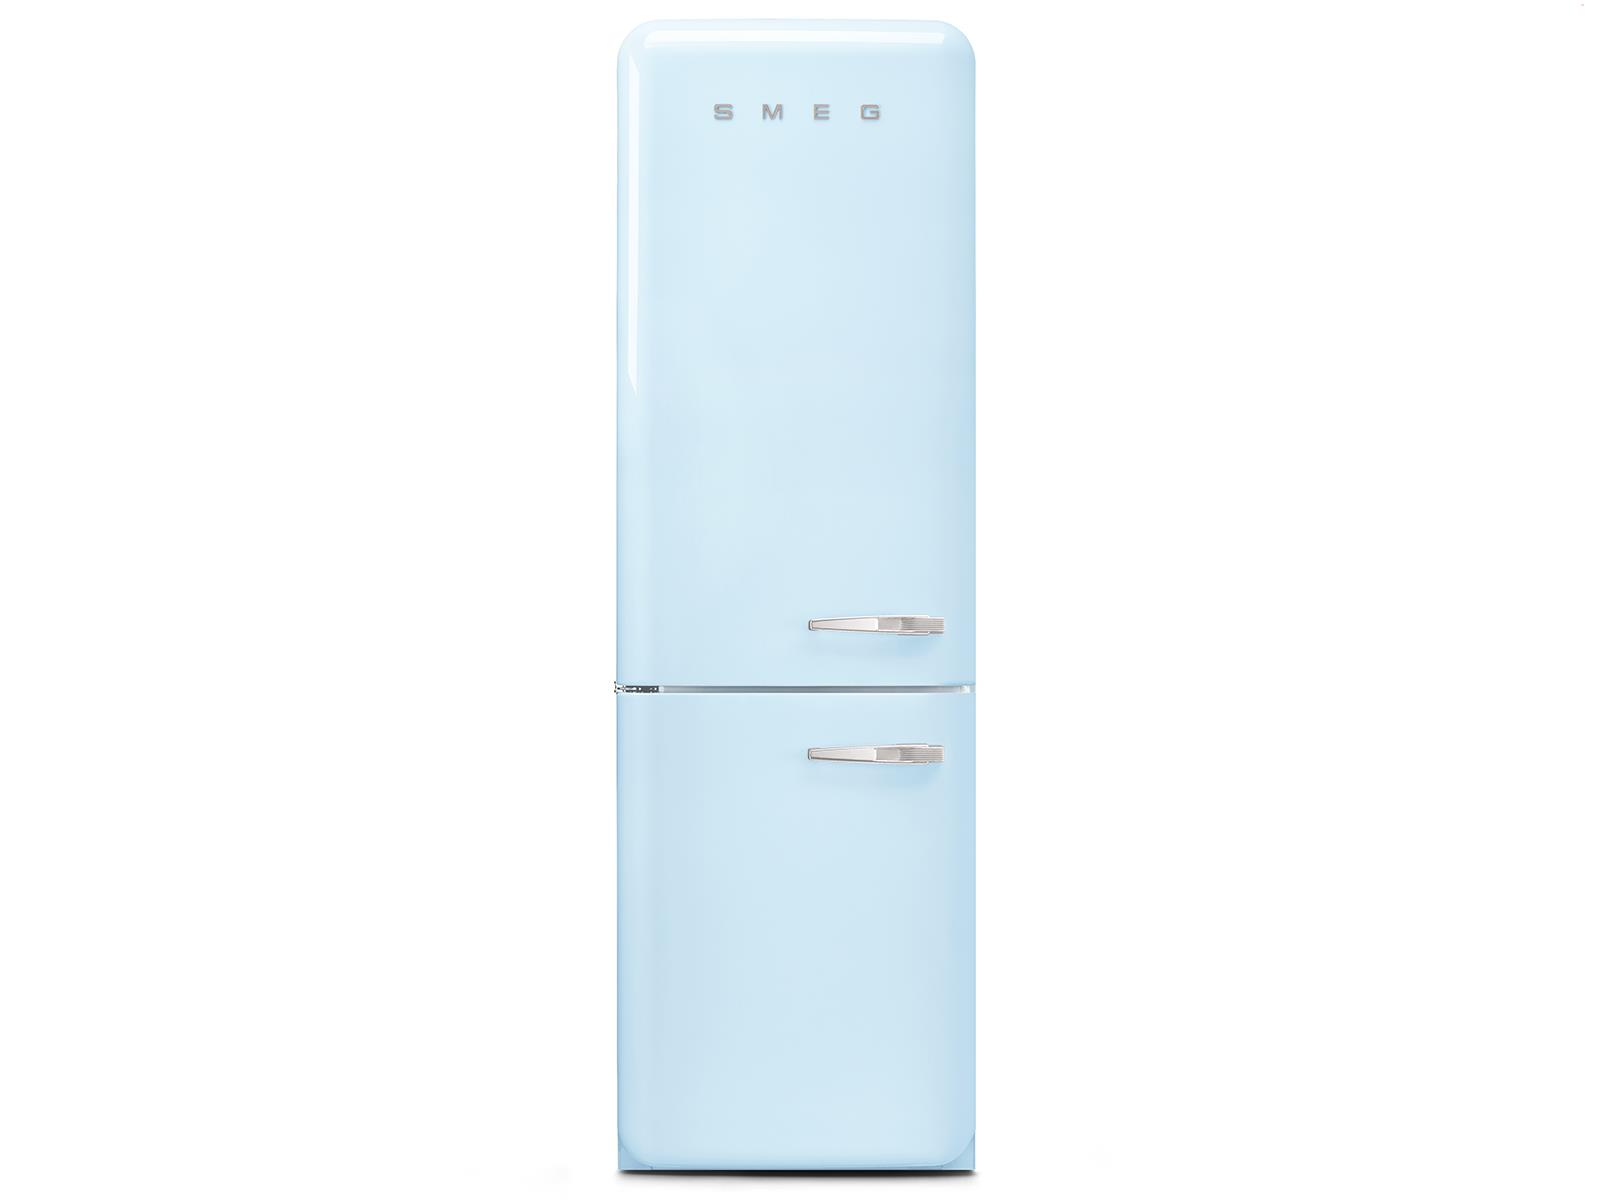 Smeg Kühlschrank Xxl : Smeg kühlschrank xxl xxl kühlschrank grundig side by side a gqn